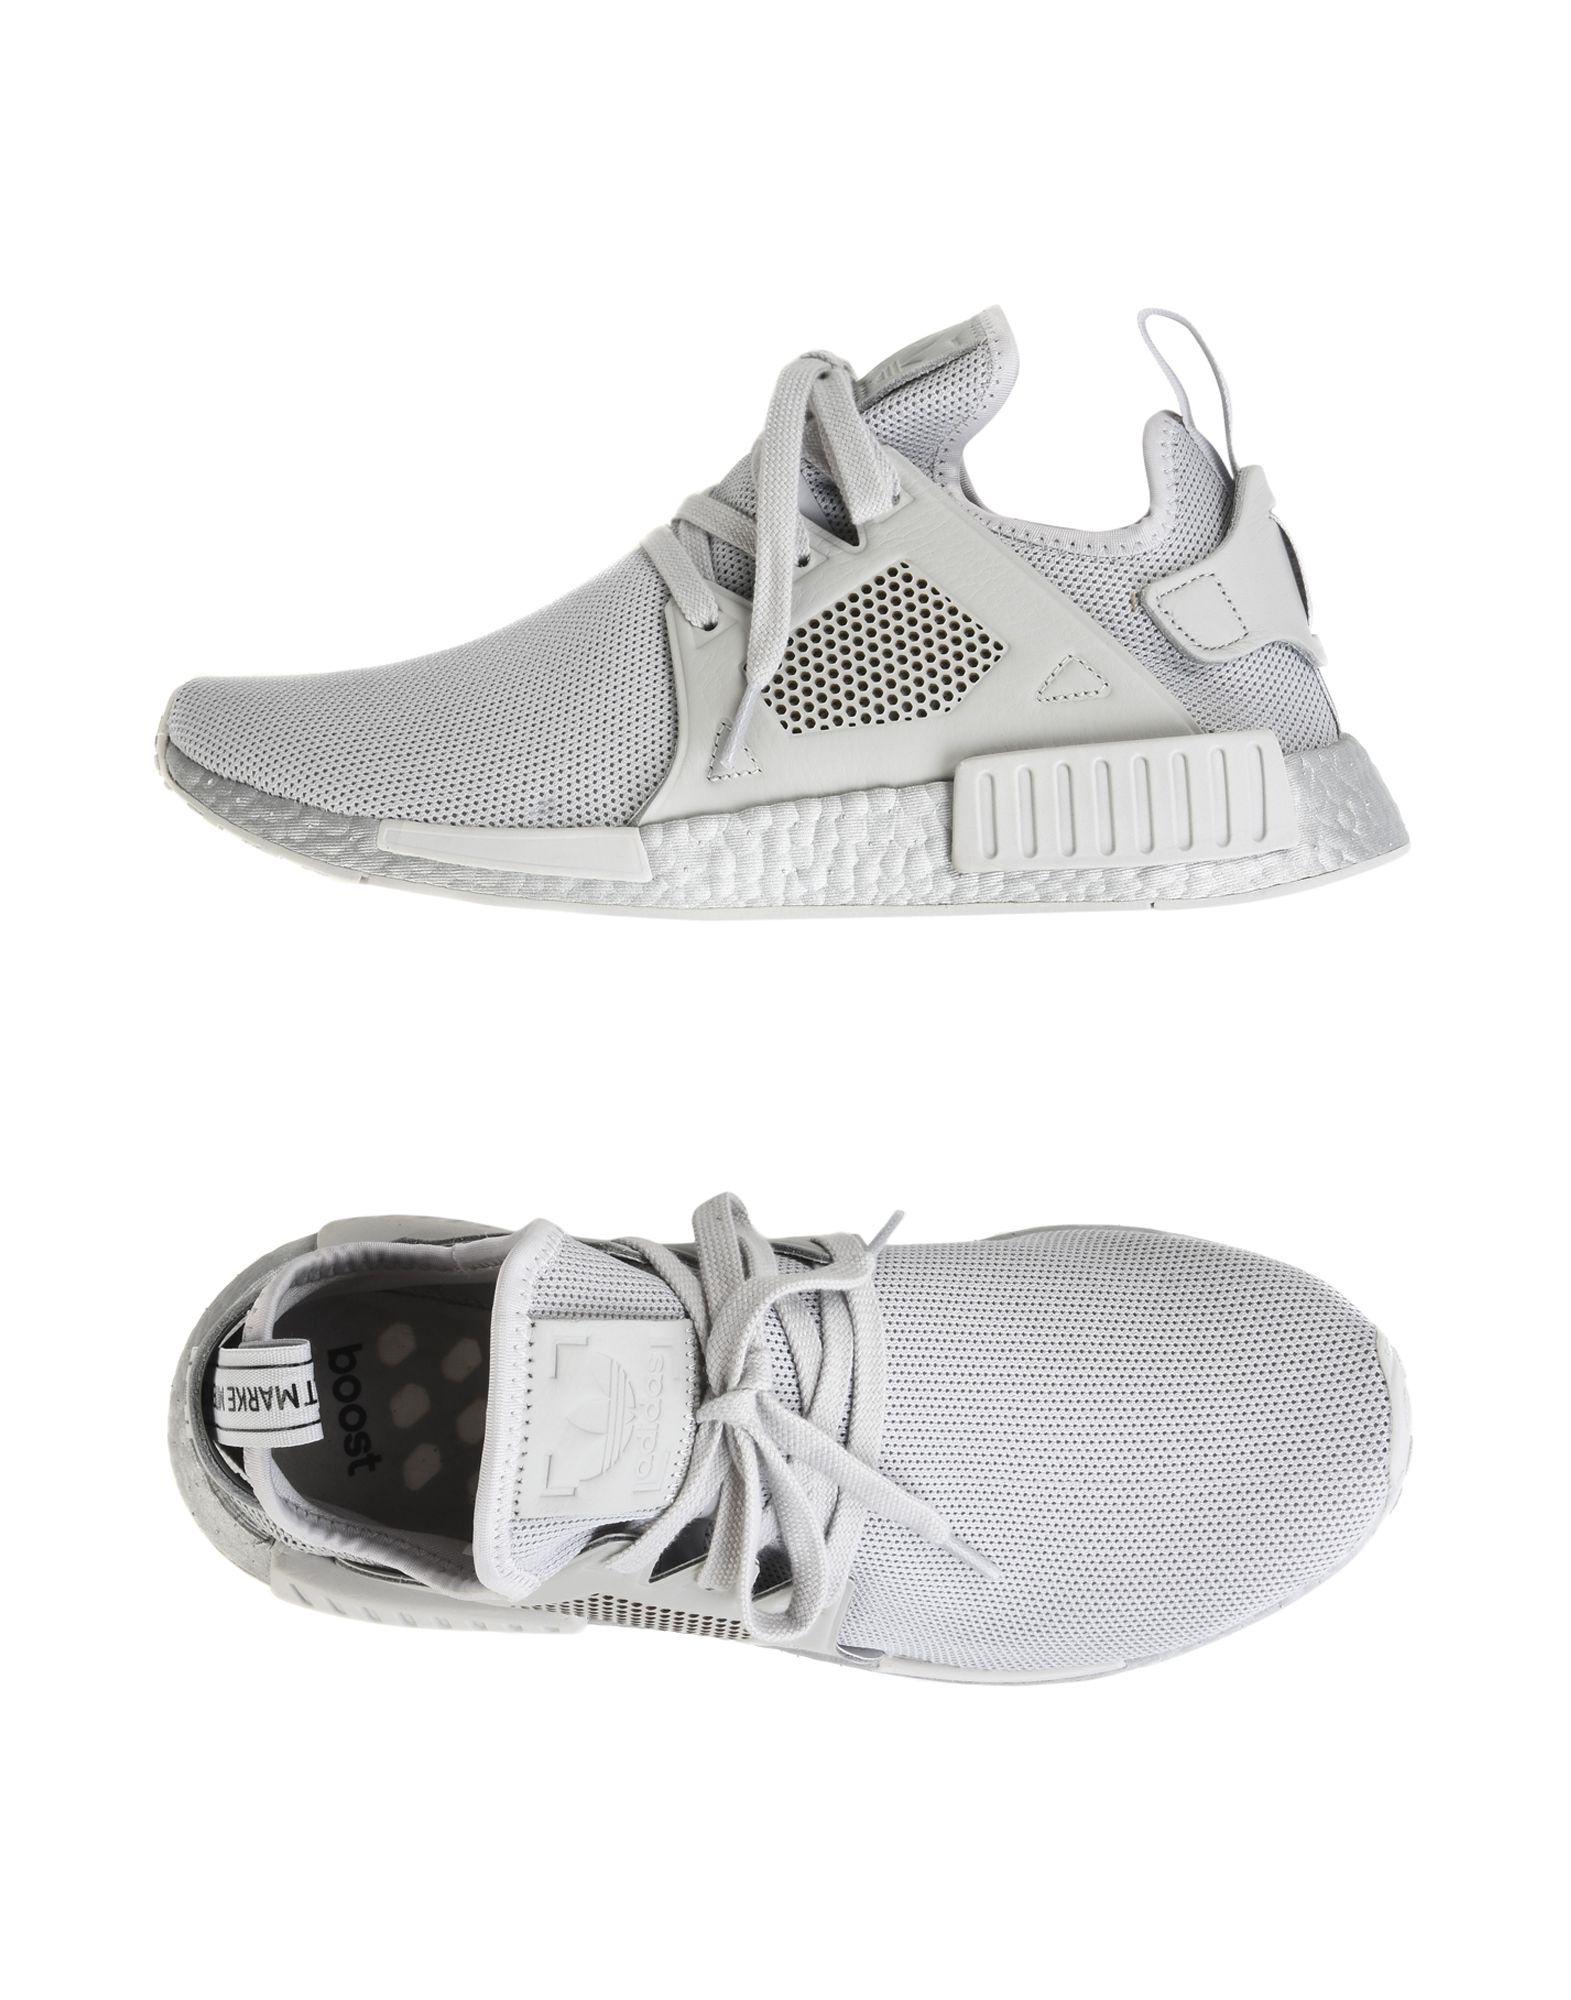 ADIDAS ORIGINALS Herren Low Sneakers & Tennisschuhe Farbe Grau Größe 9 - broschei